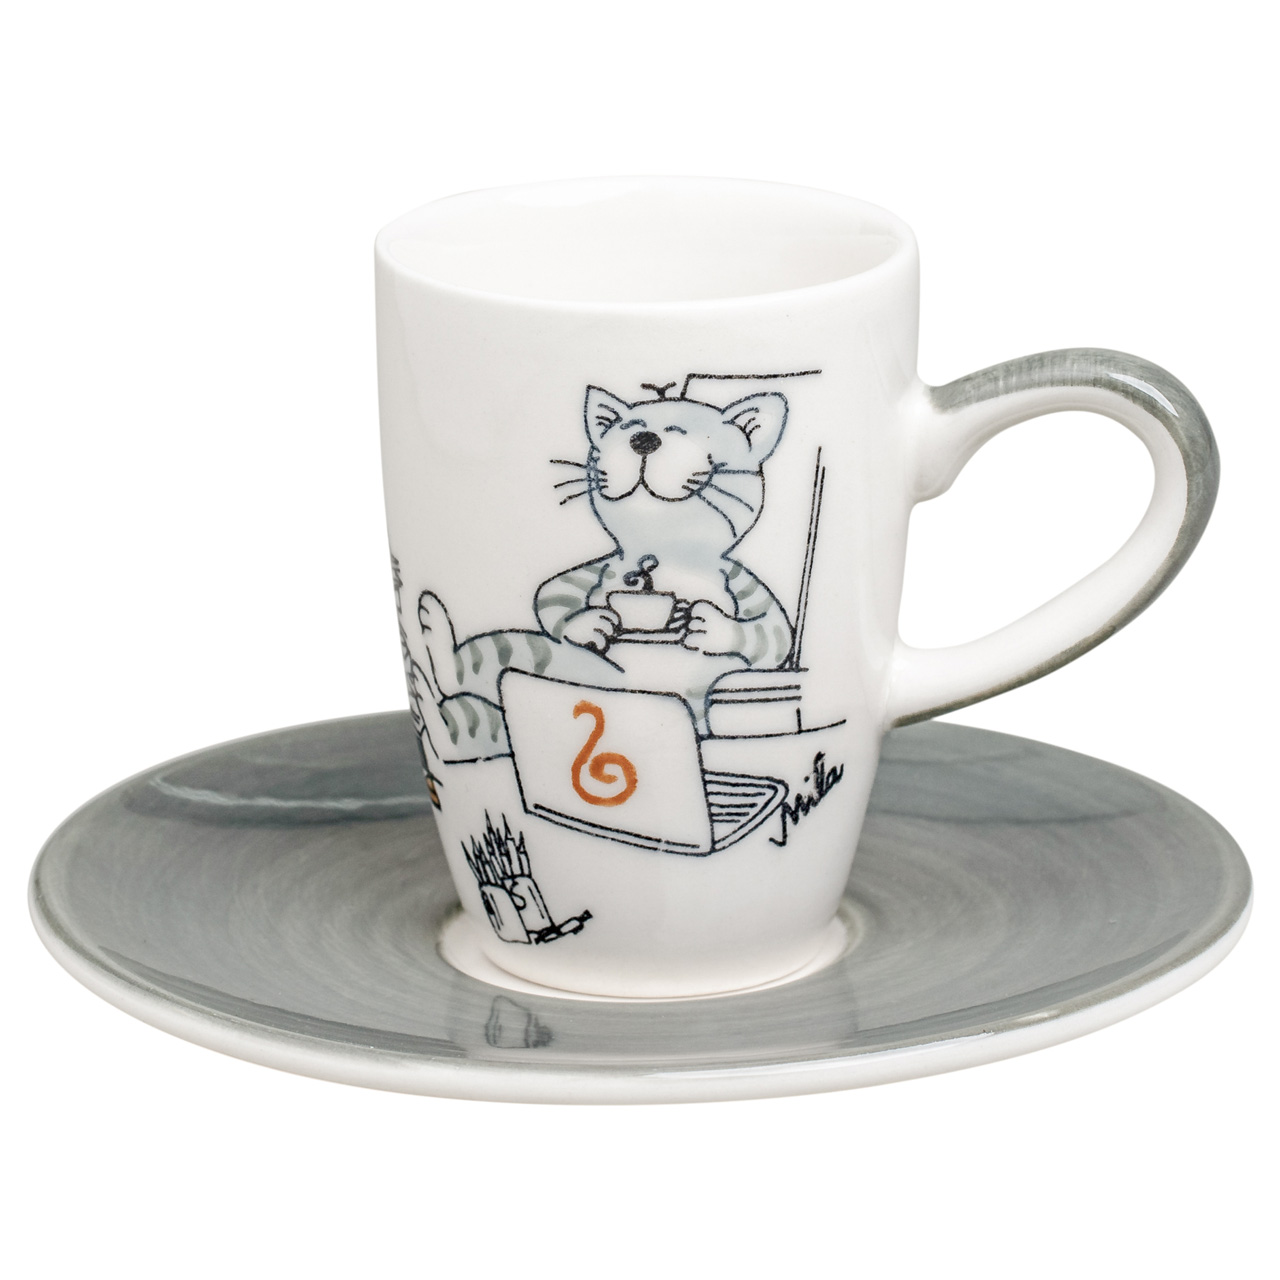 Espresso Tasse - Oommh... relax - take it easy